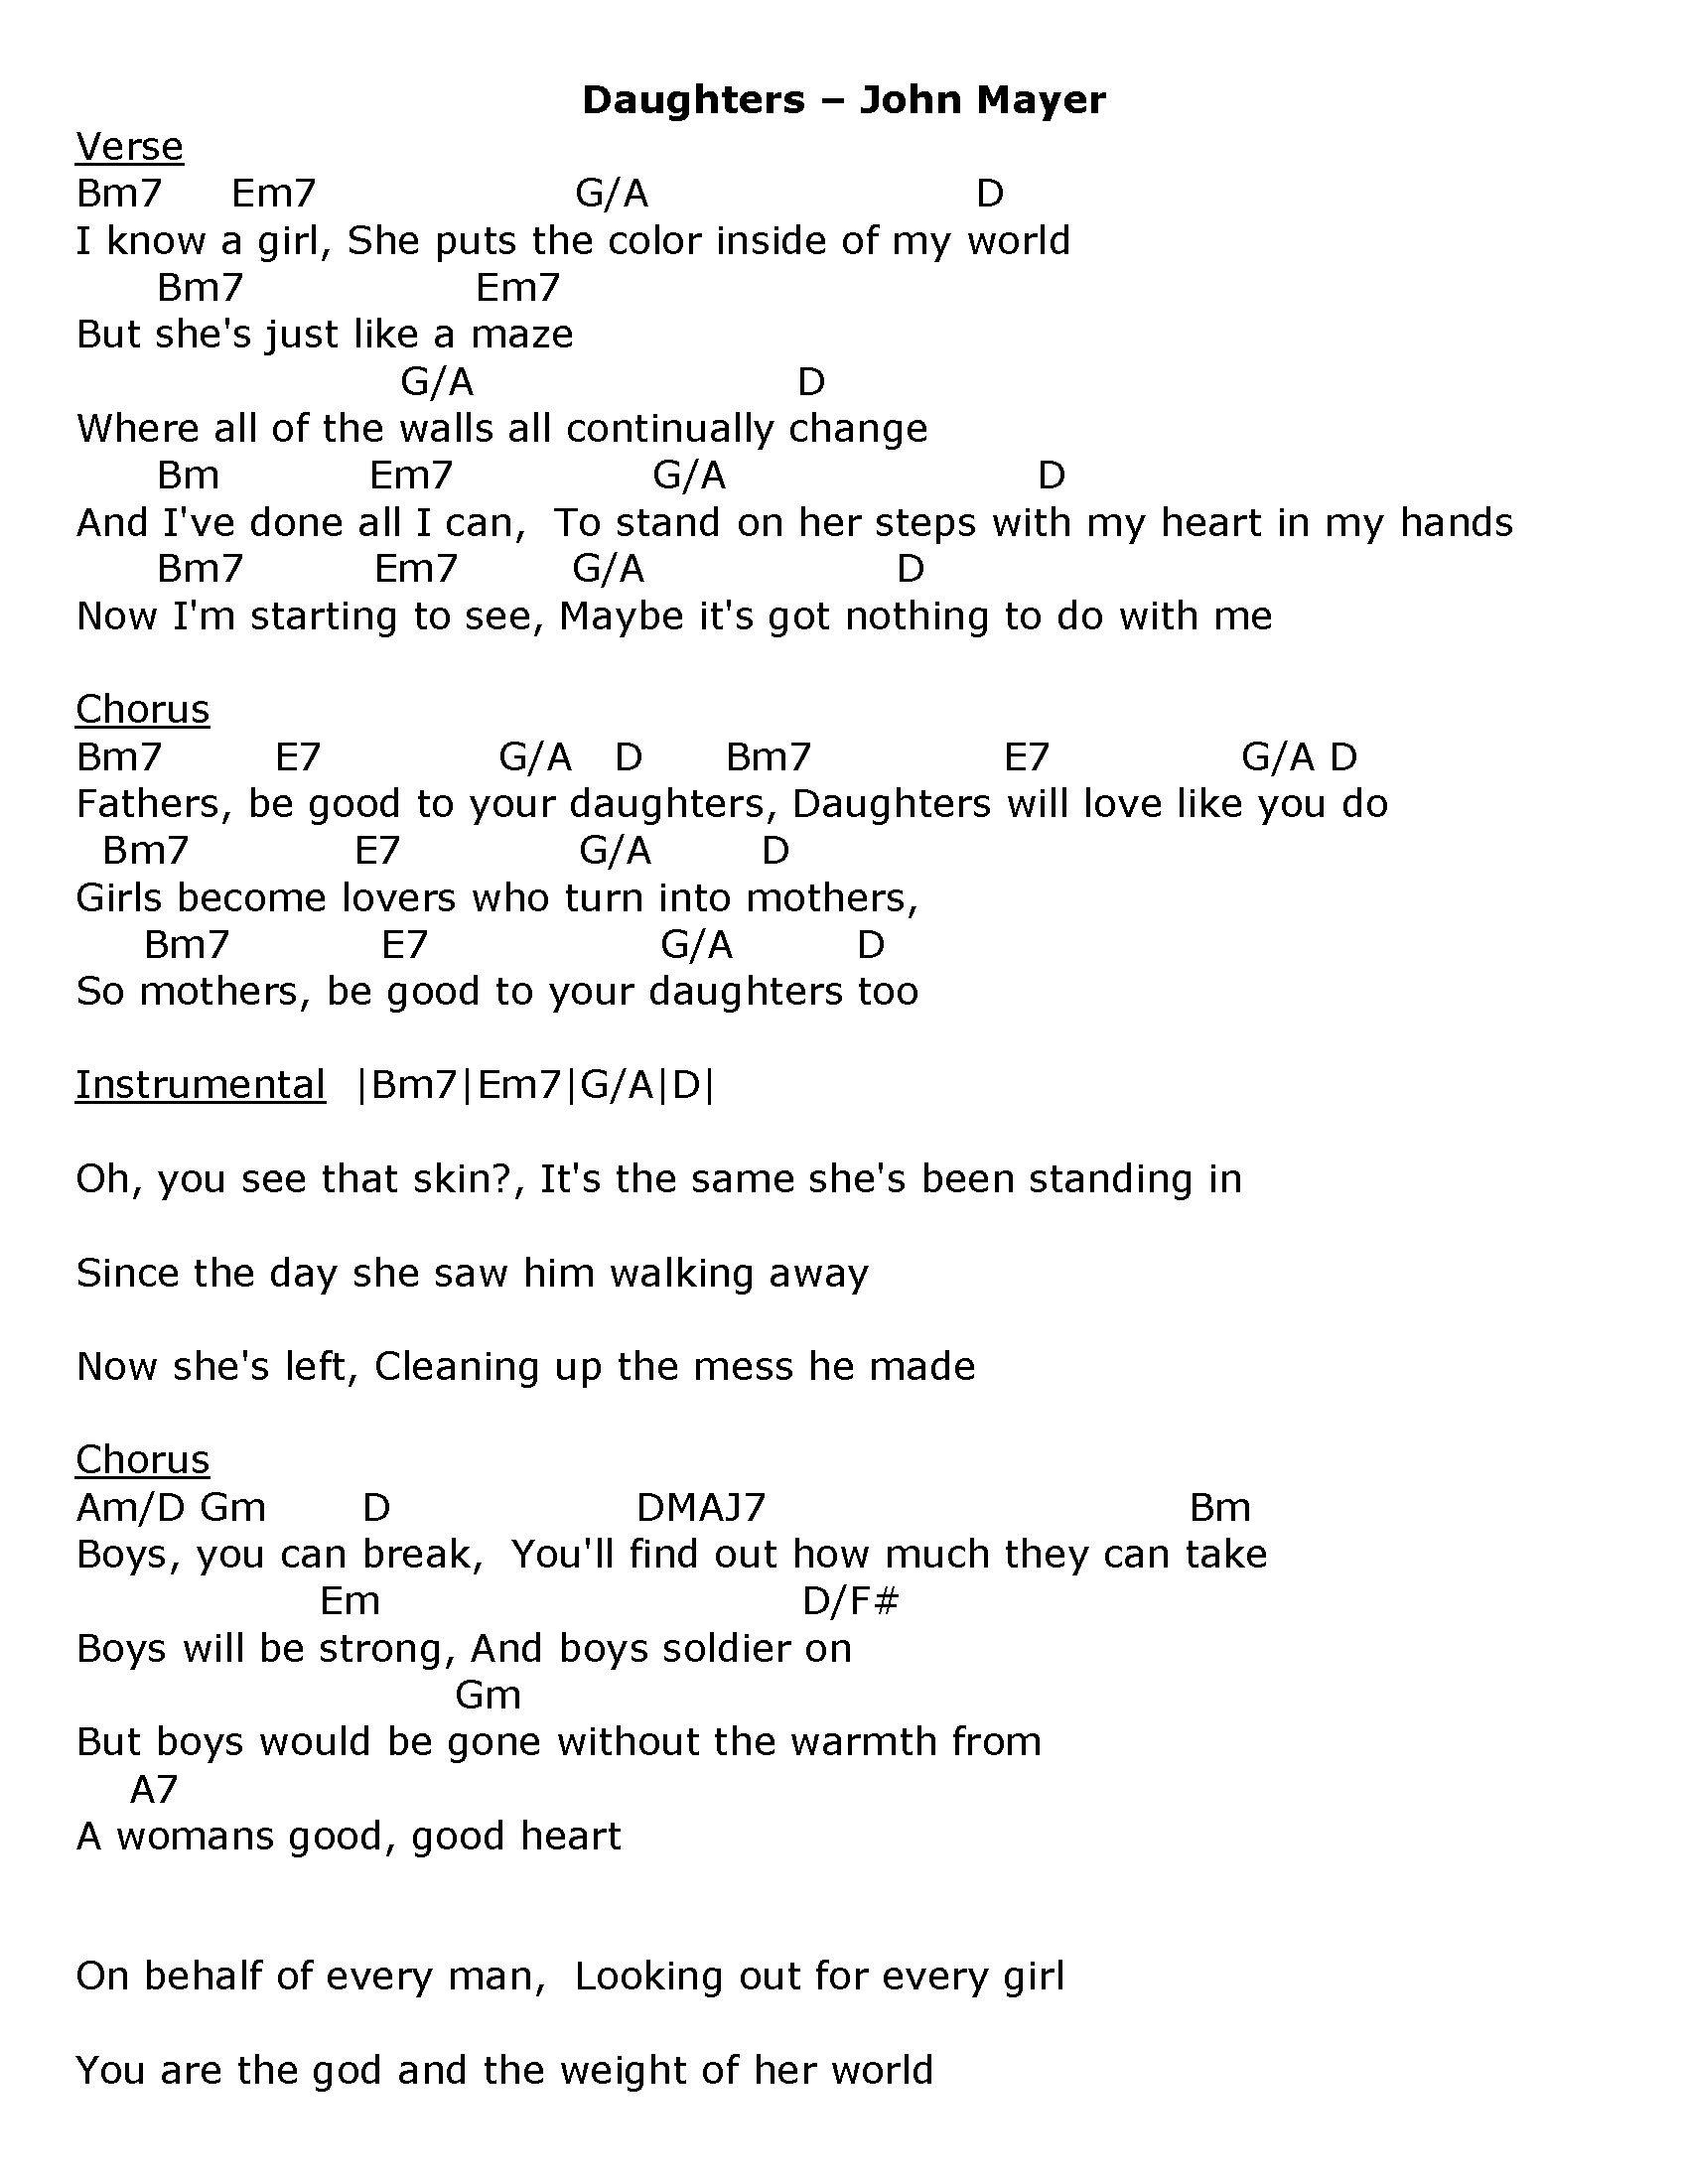 Daughters John Mayer Lyrical Perfection Lyrics Pinterest